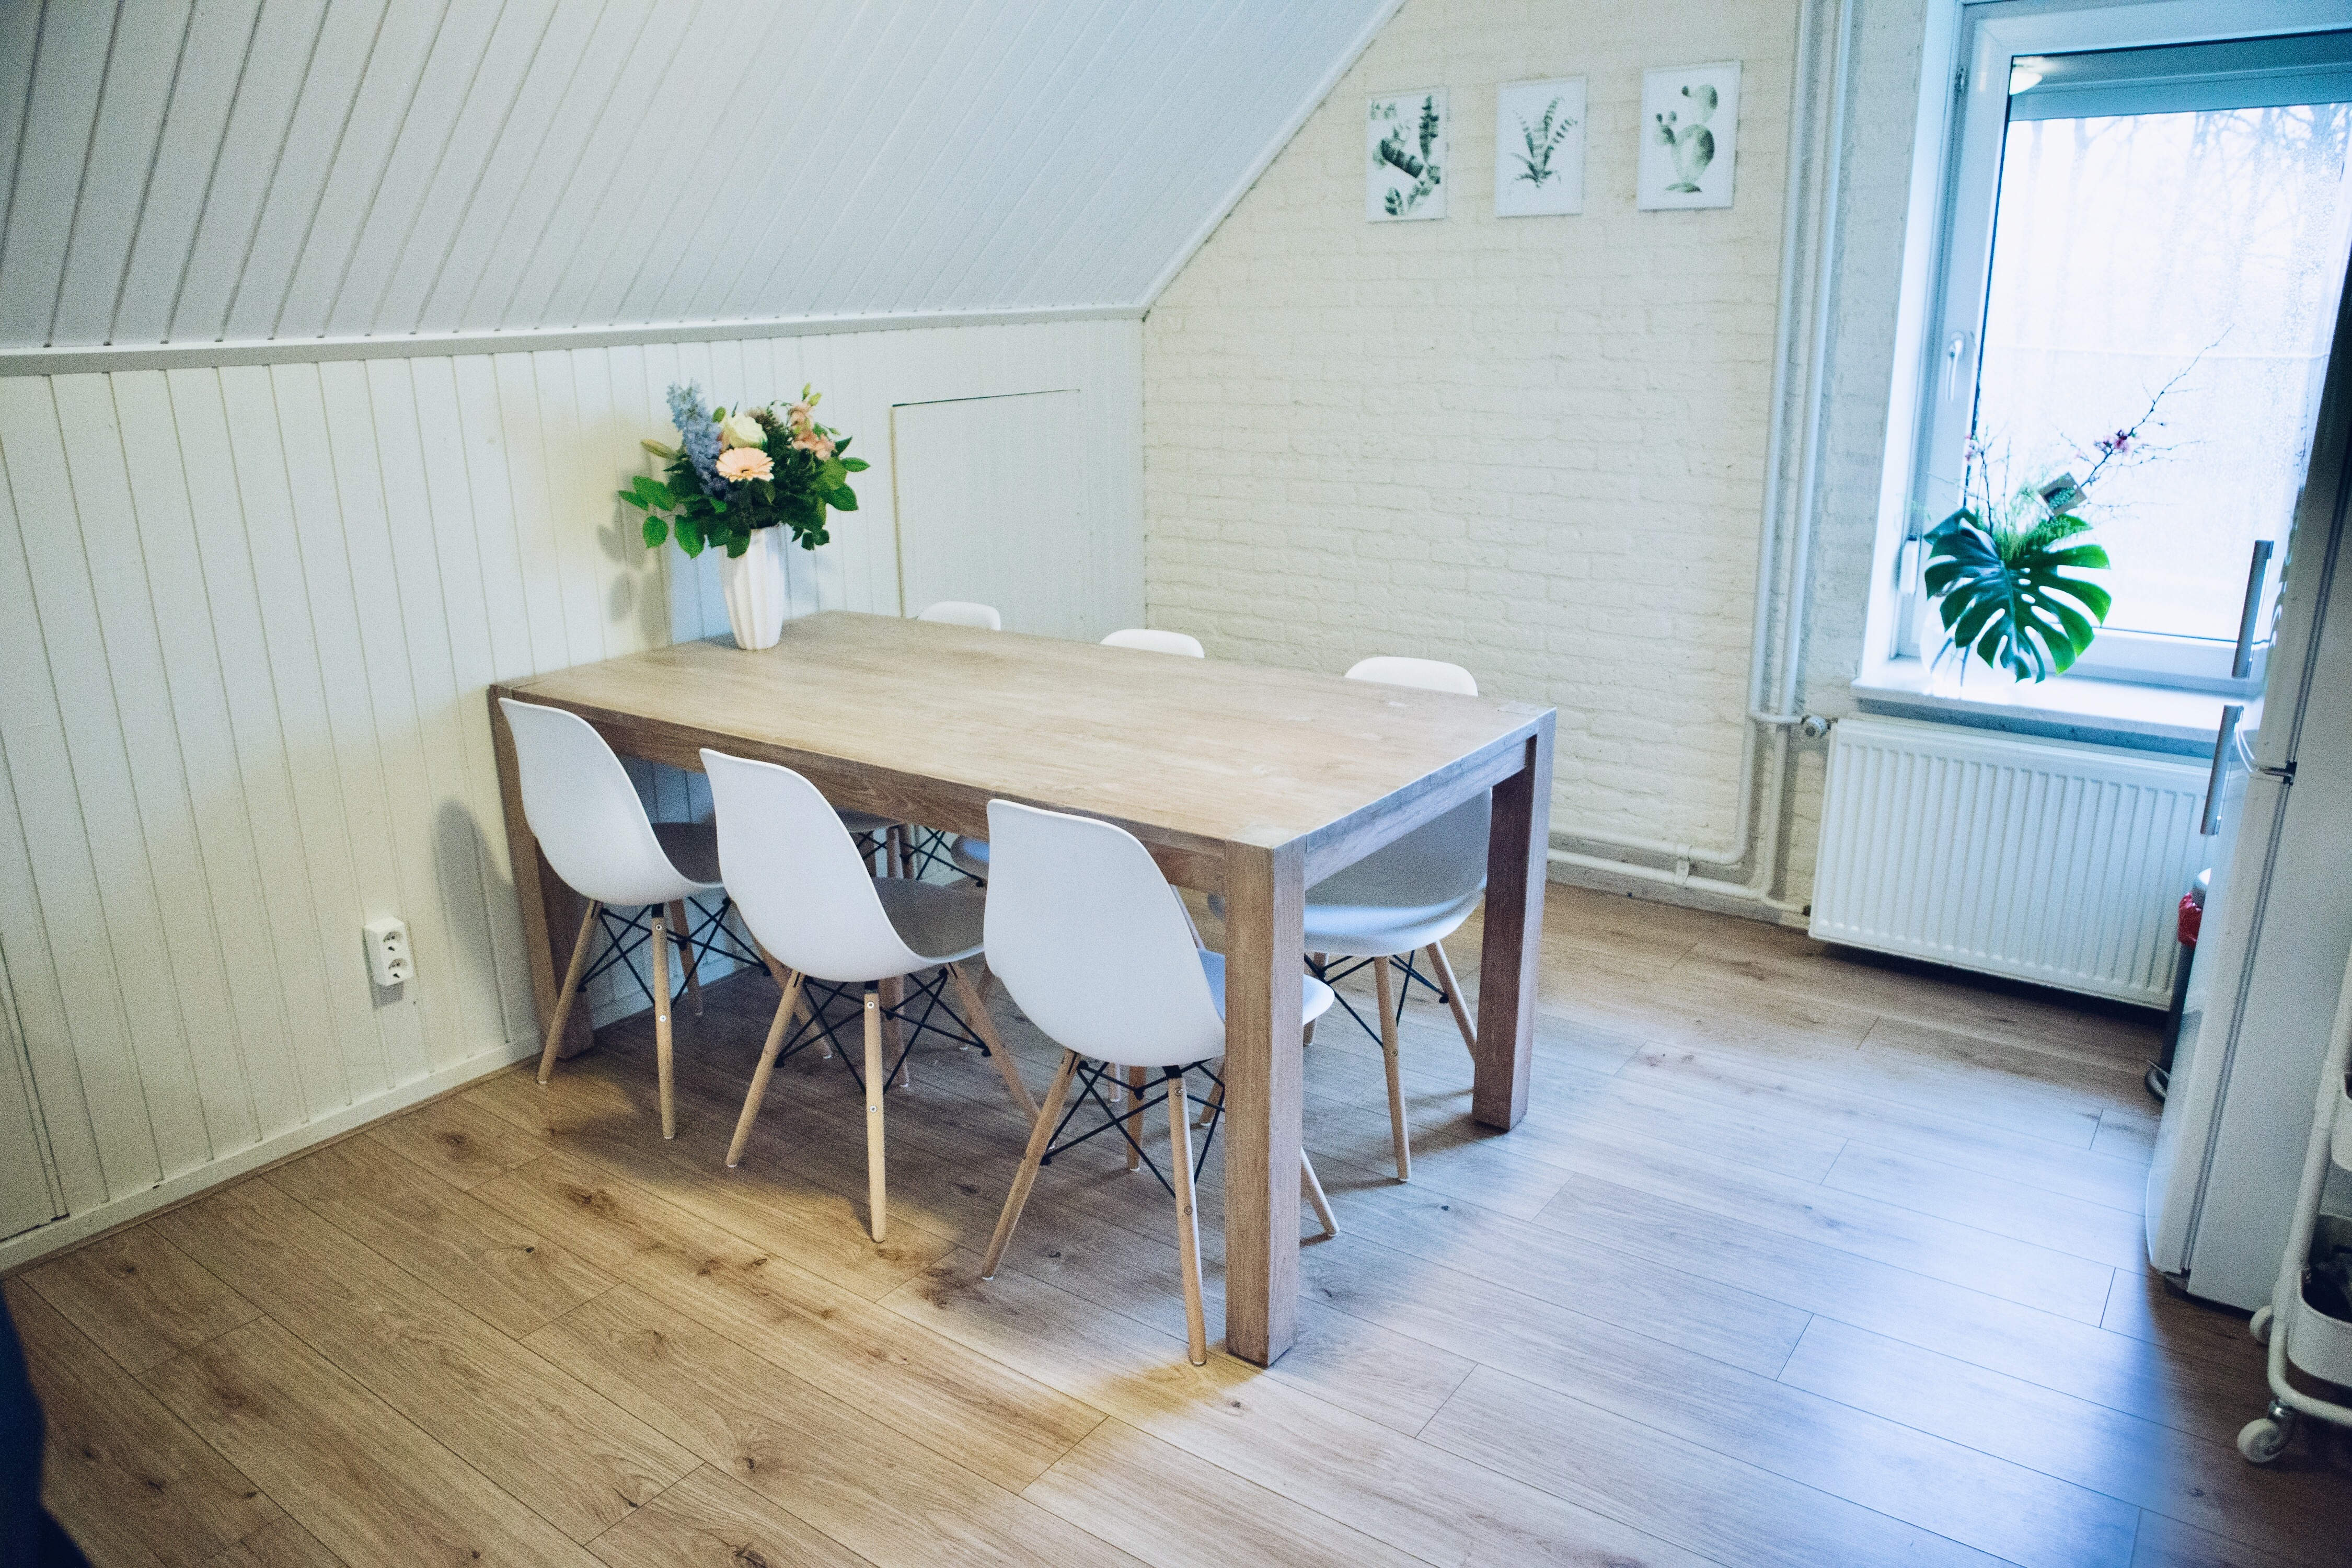 By Noth, Volero, Eyoba, tafels, stoelen, posters, girl, blog, blogger, happy, smile, interieur, inrichting, meubels, accessoires,